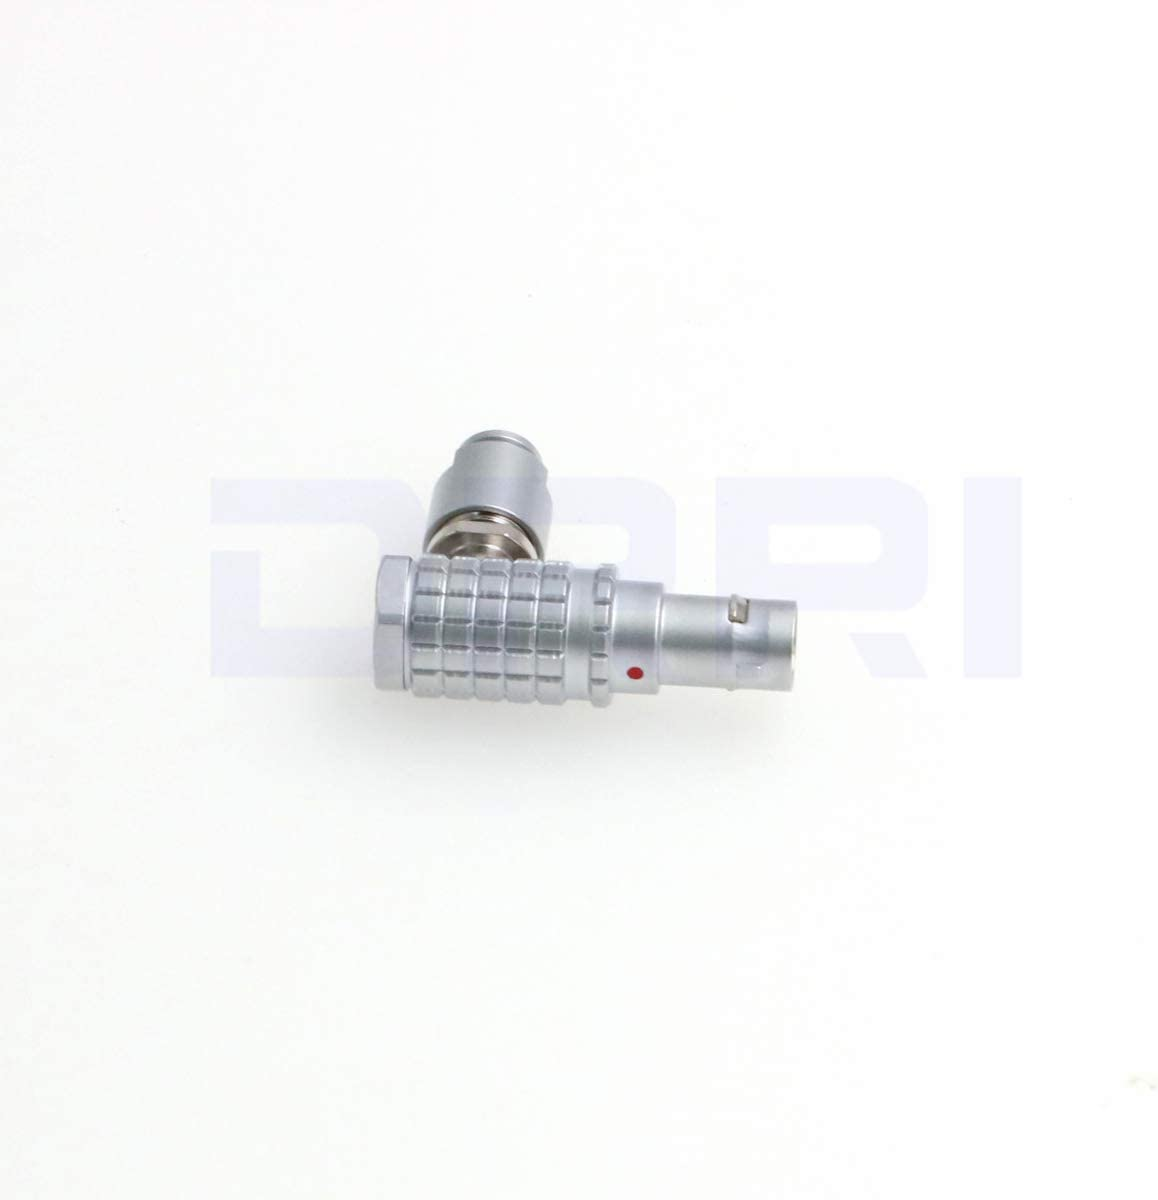 DRRI 0B FHG 4pin Plug Replacement FHG.0B.304.CLAD52 for Arri Lbus Fiz Mdr Wireless Focus Cforce Lens Power Cable